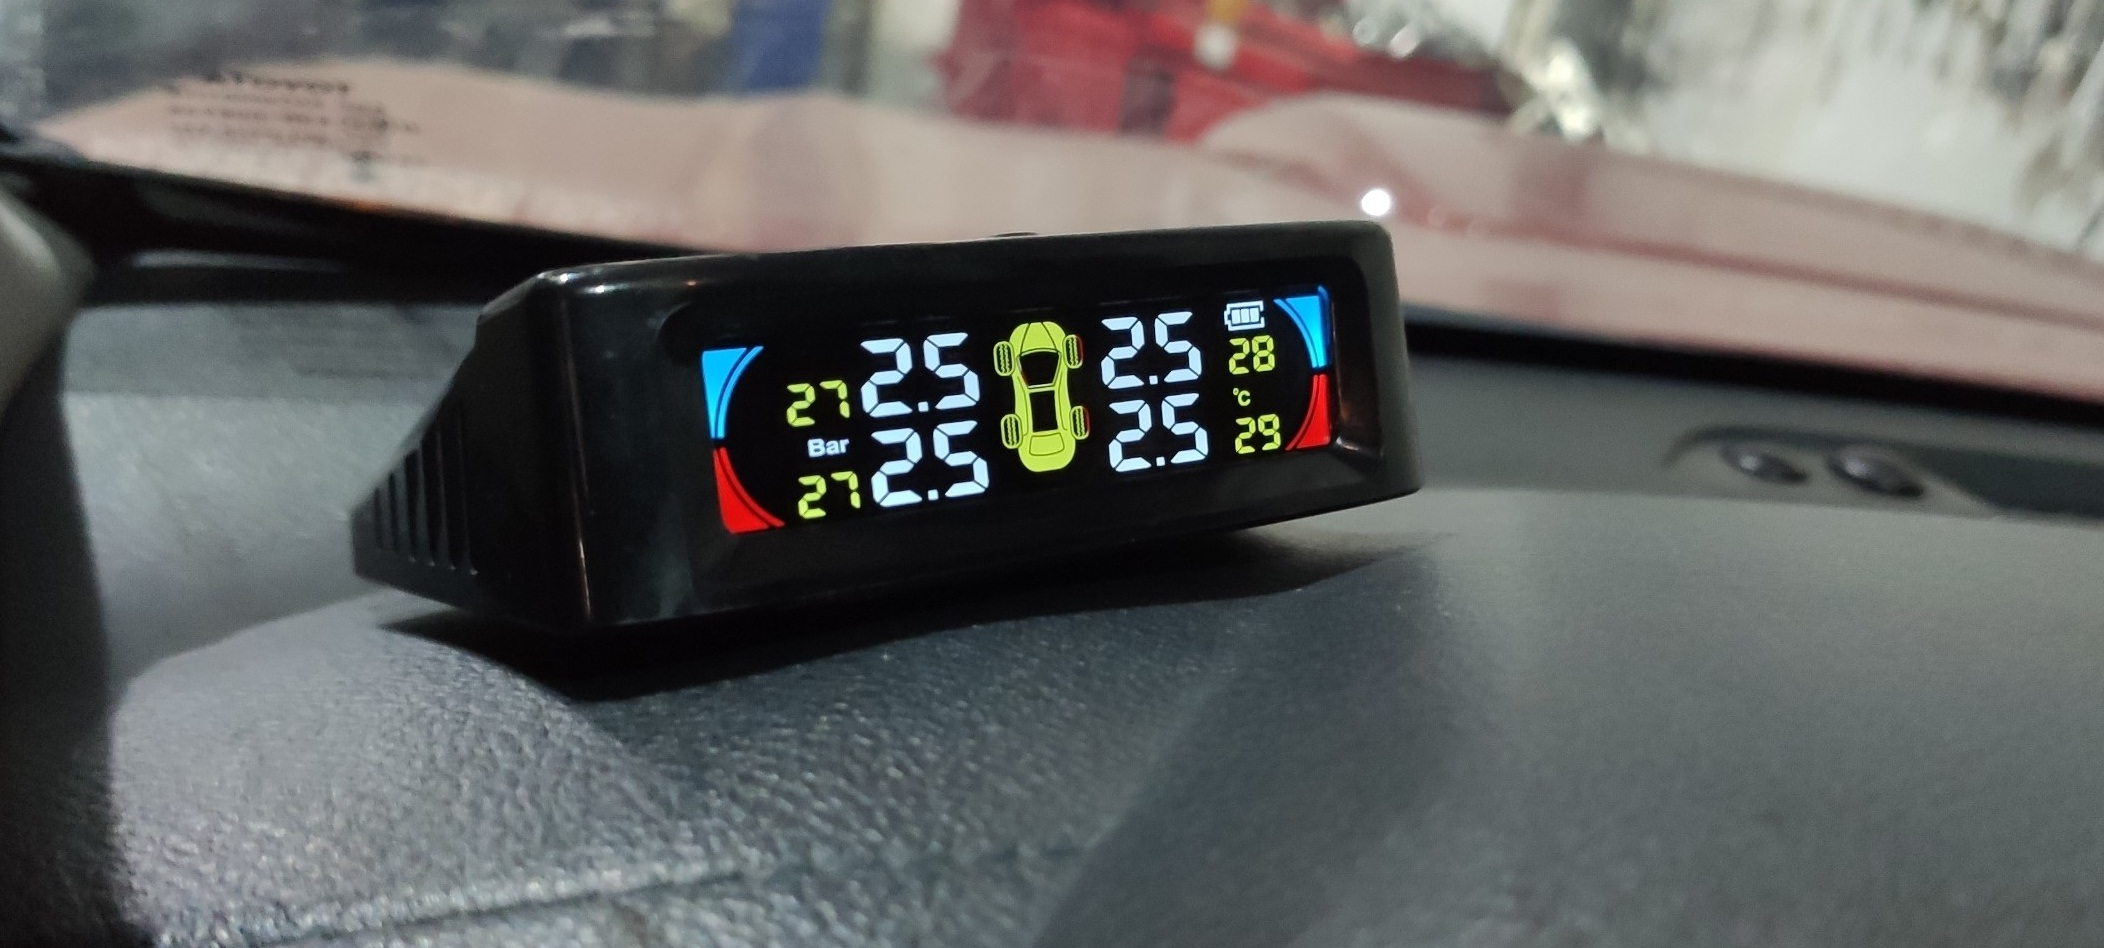 Lắp cảm biến áp suất lốp cho xe Toyota Hilux